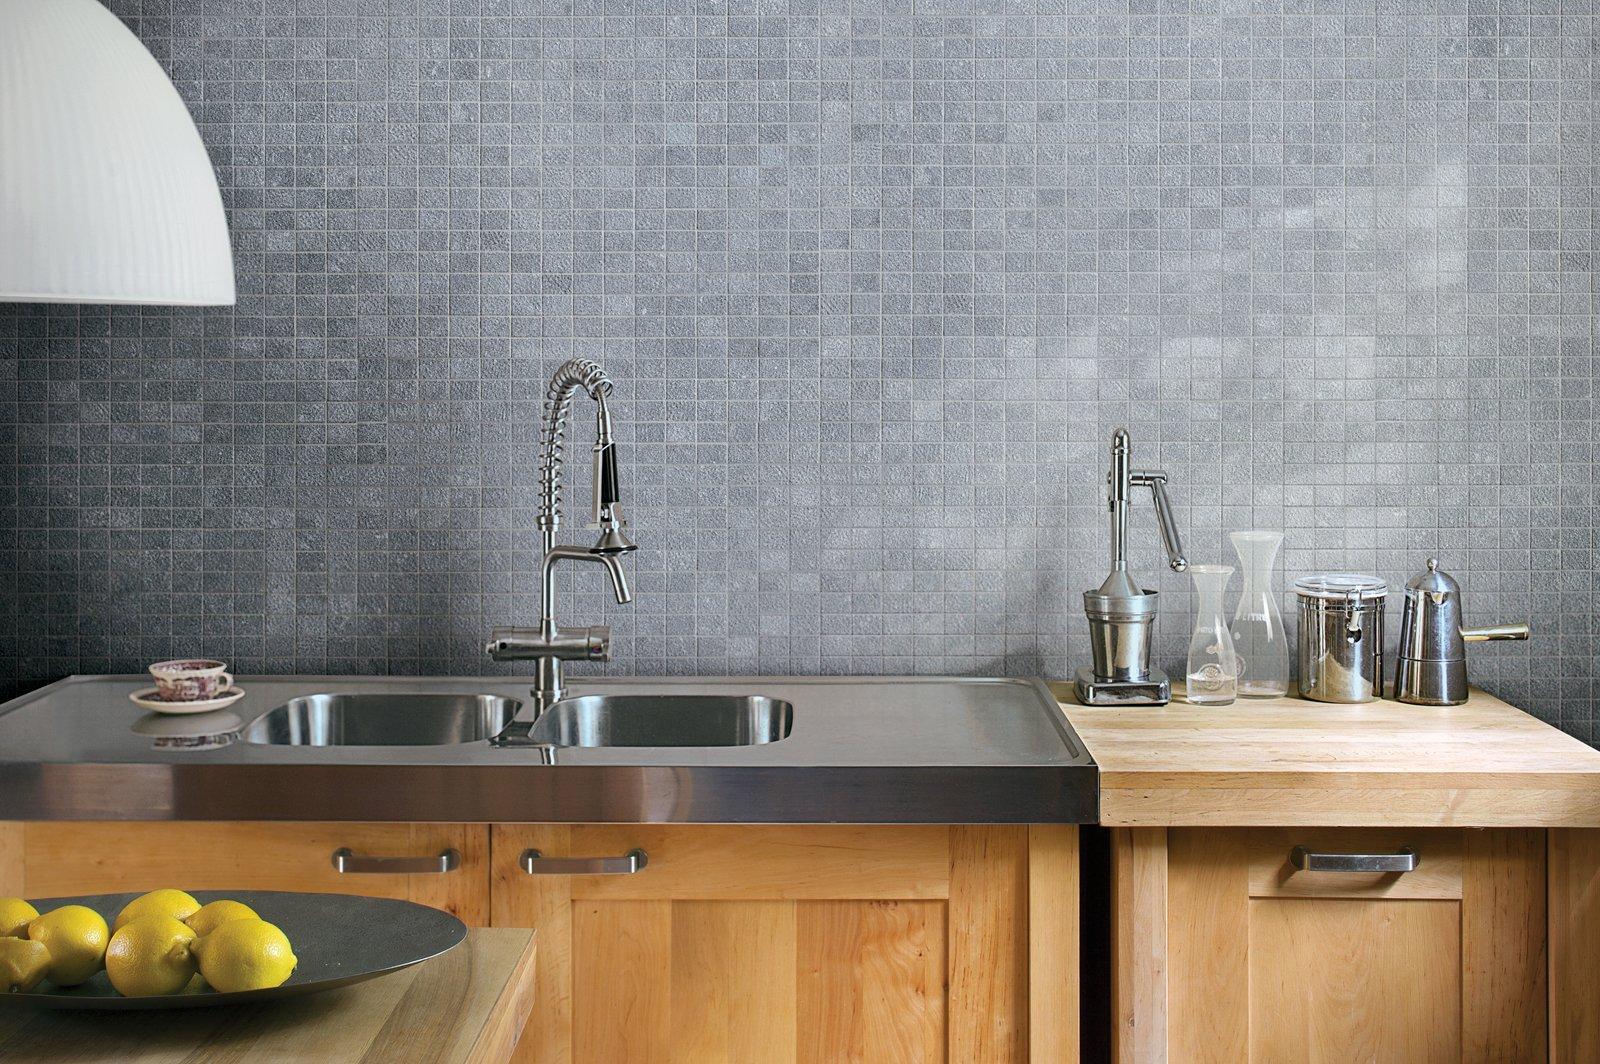 Cucina piastrelle per le pareti cose di casa - Piastrelle per cucina in muratura ...